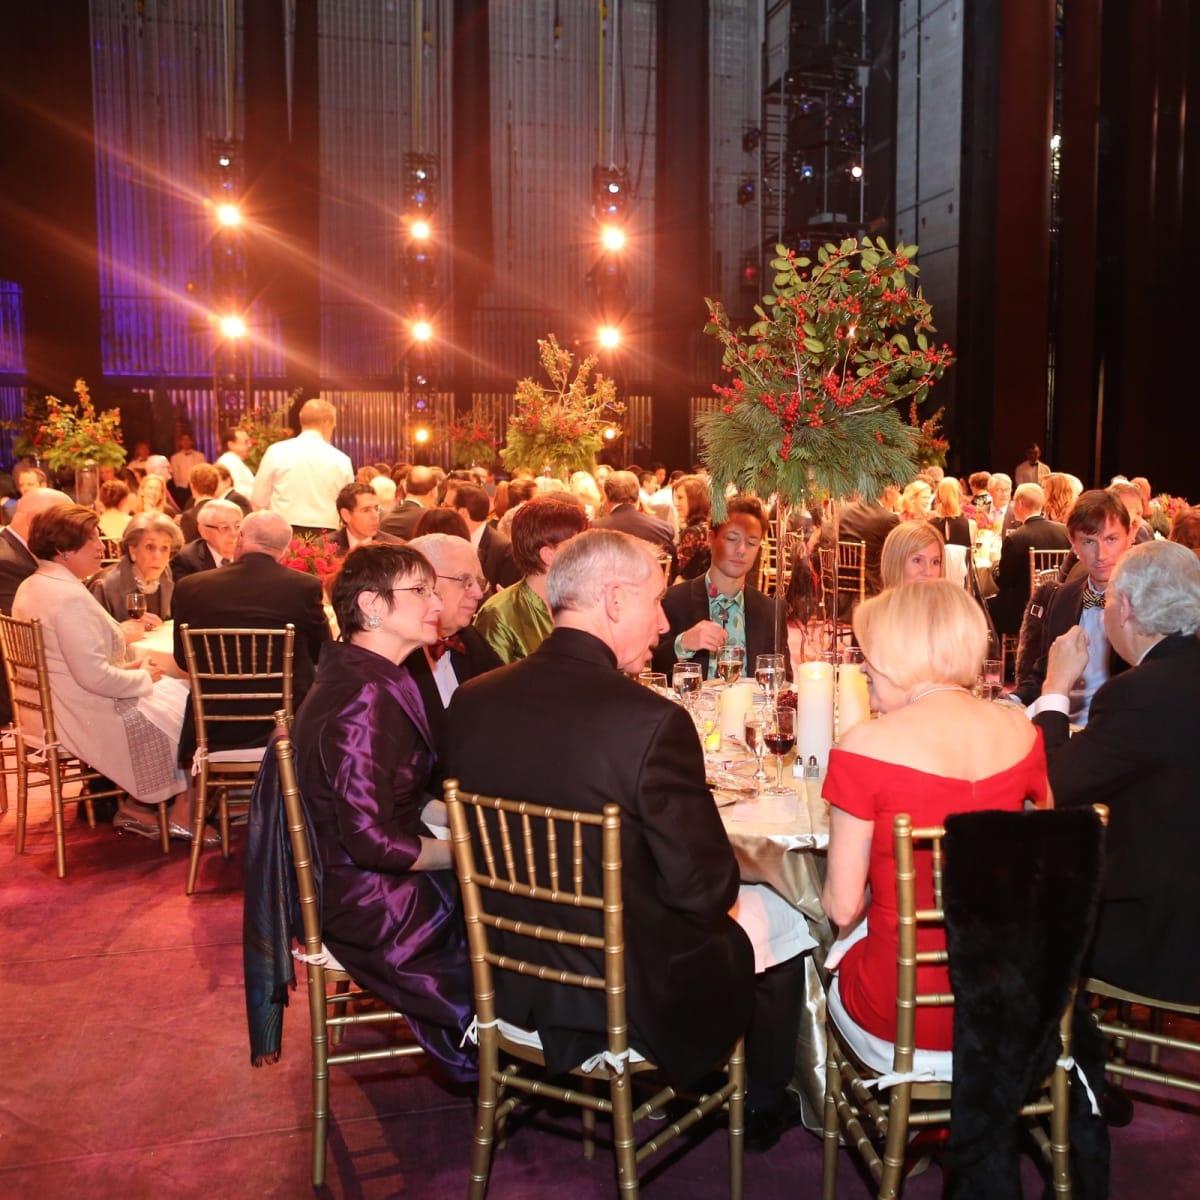 News, Houston Ballet Jubilee of Dance, Dec. 2015, On stage dinner